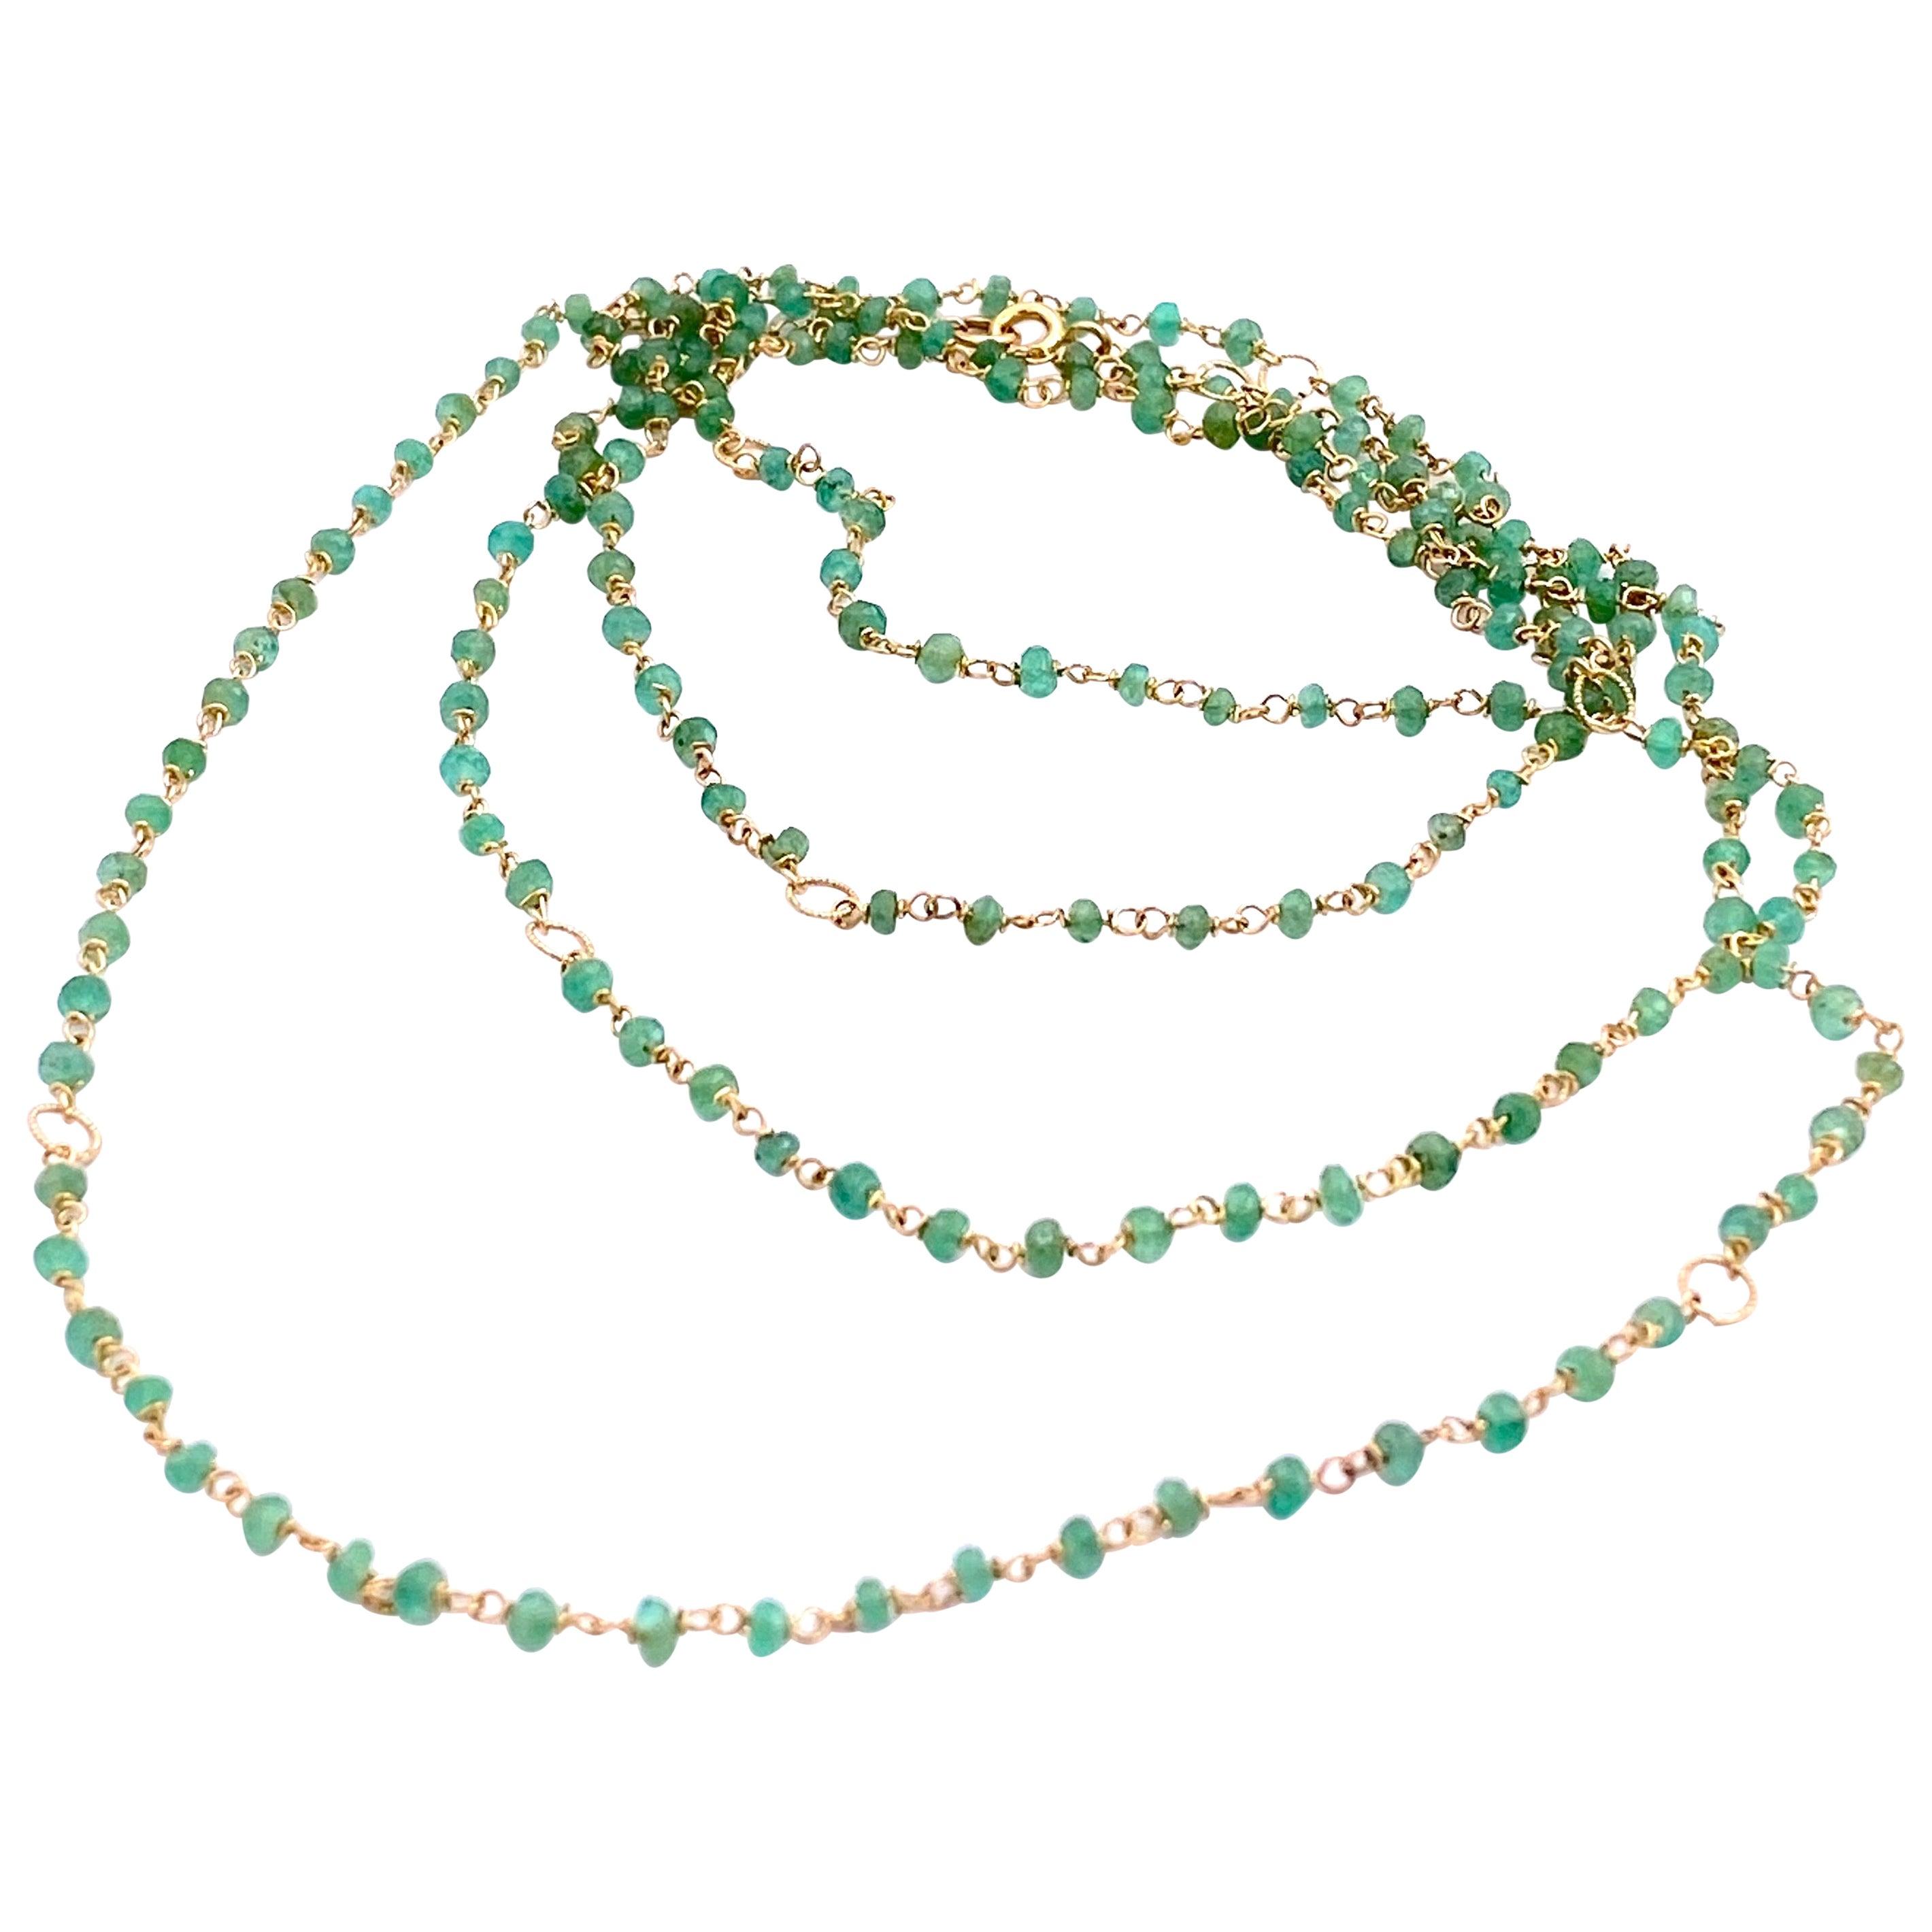 Art Deco Style 18Karat Gold 45karat Emeralds Twisted Chain Beaded Necklace